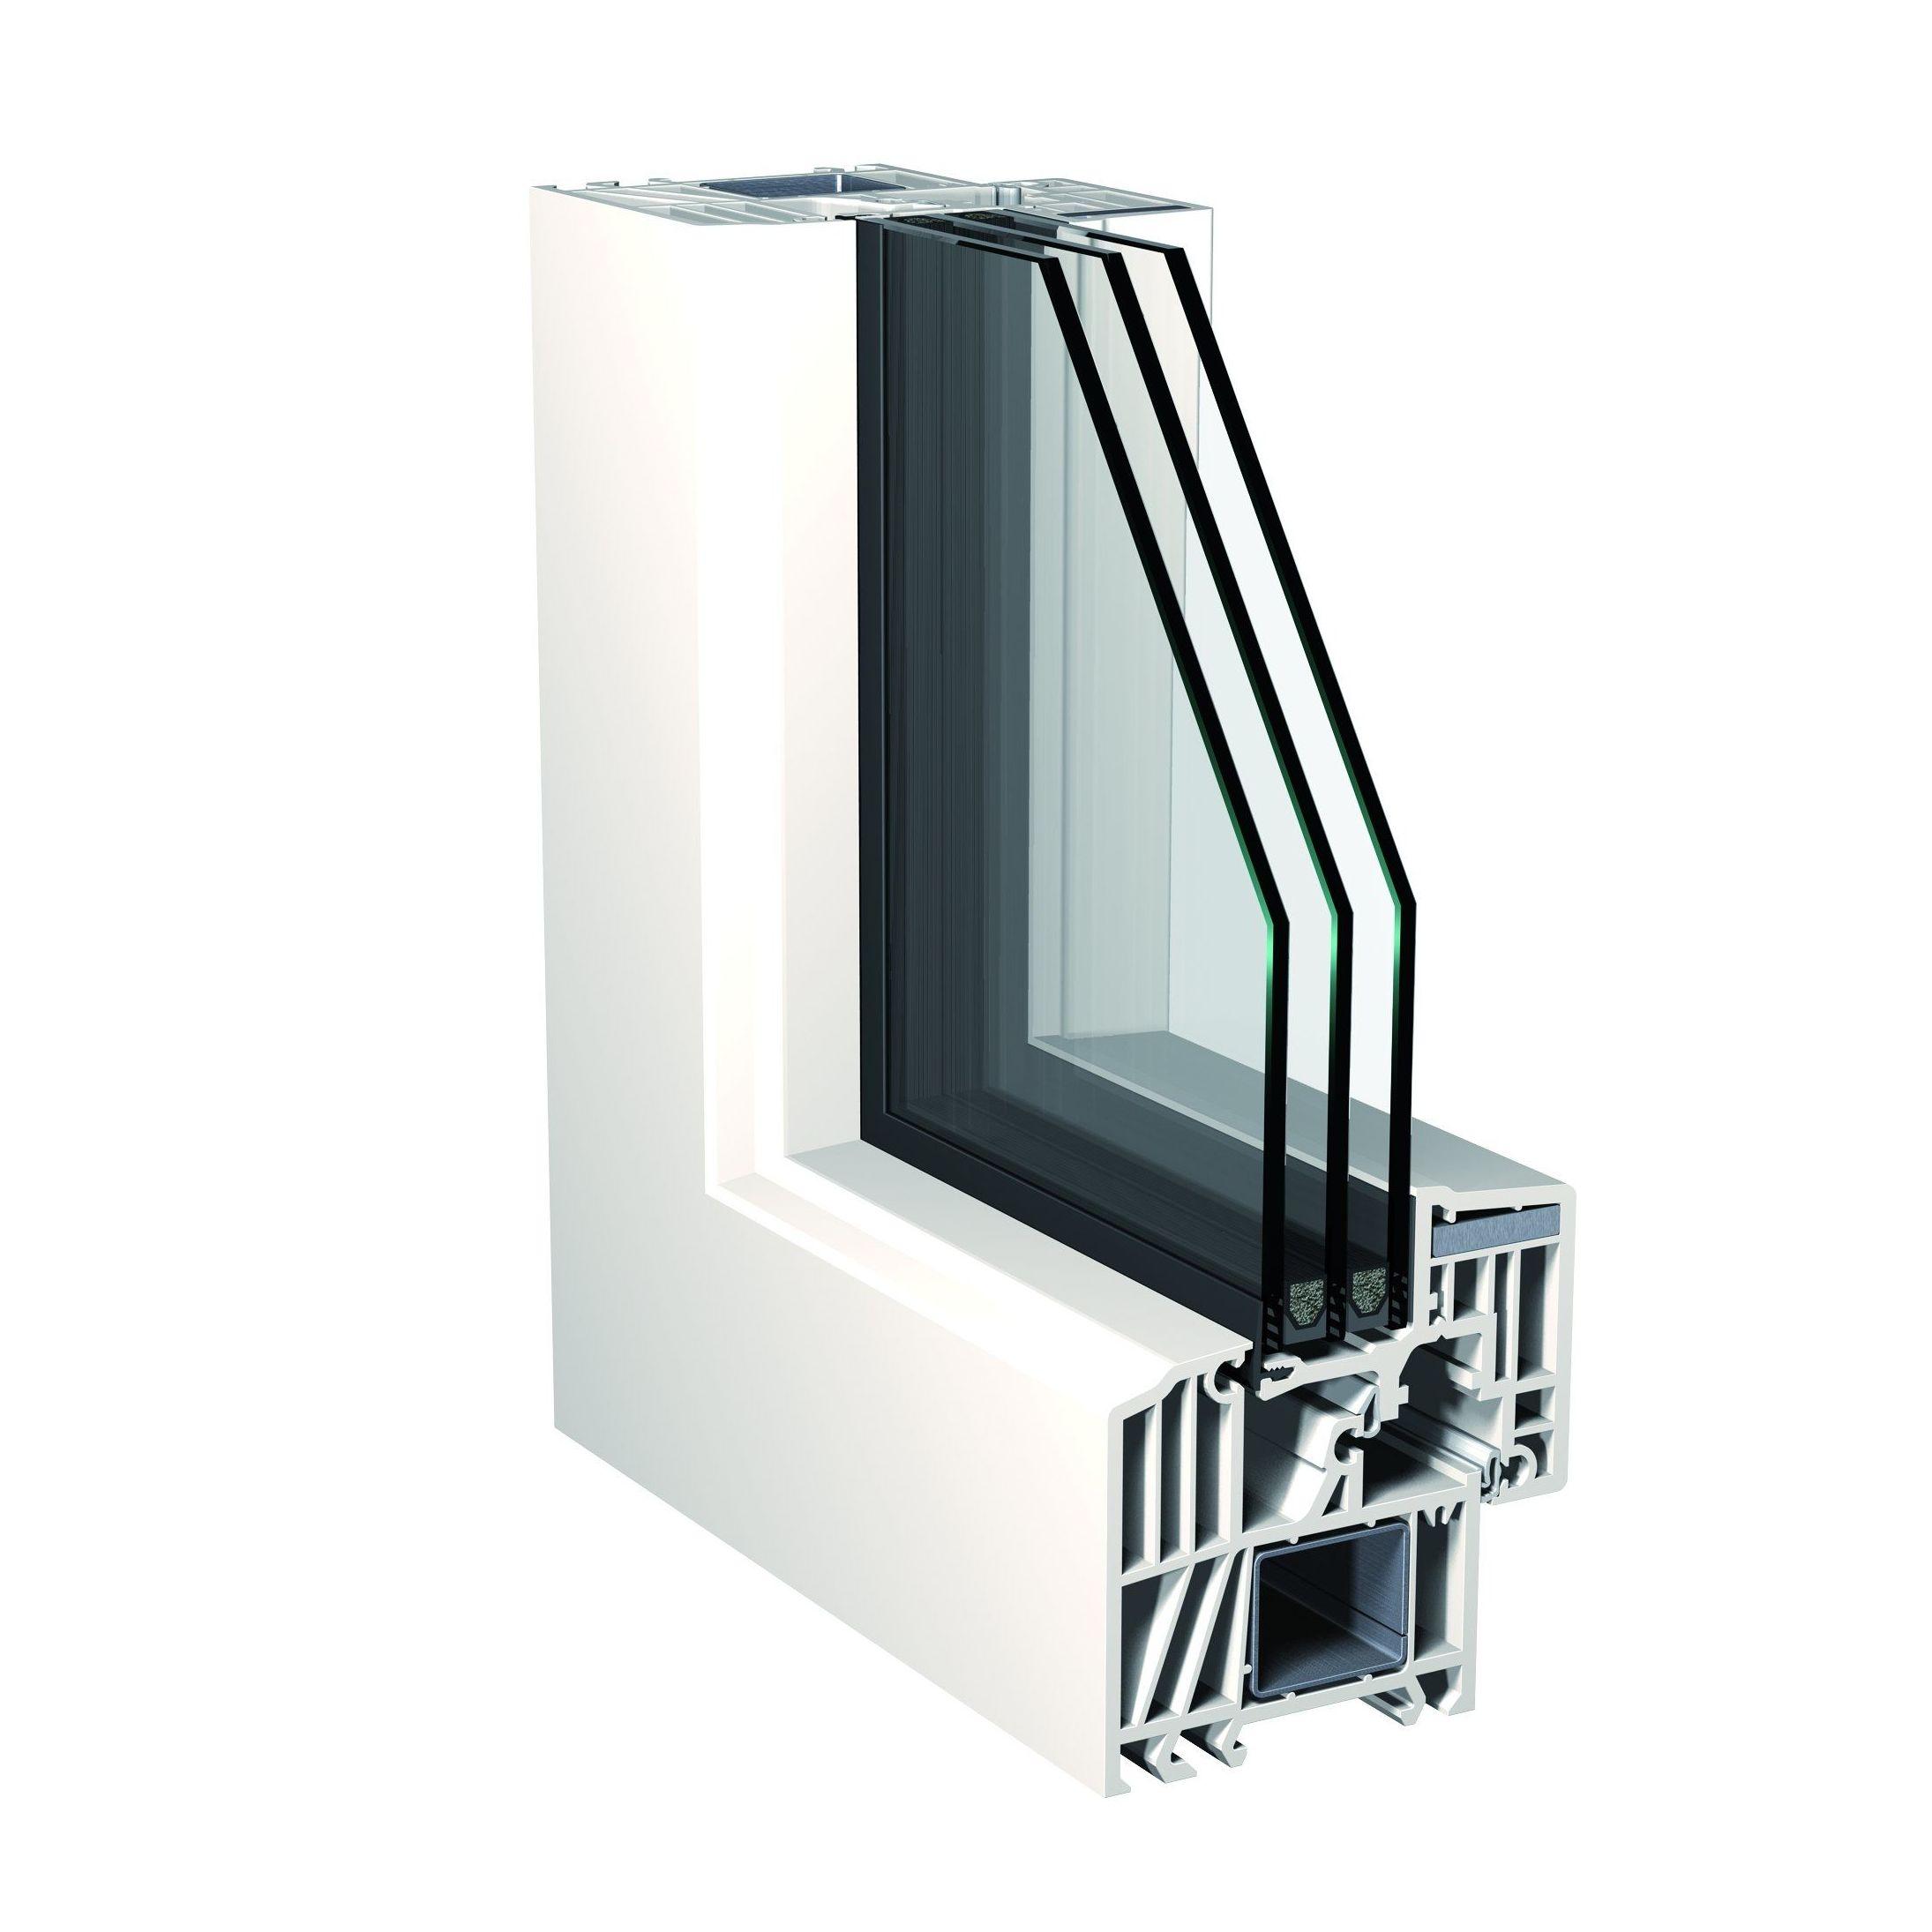 Ventanas de aluminio: Productos de Carpintería de PVC y Aluminio Ercalum, S.L.